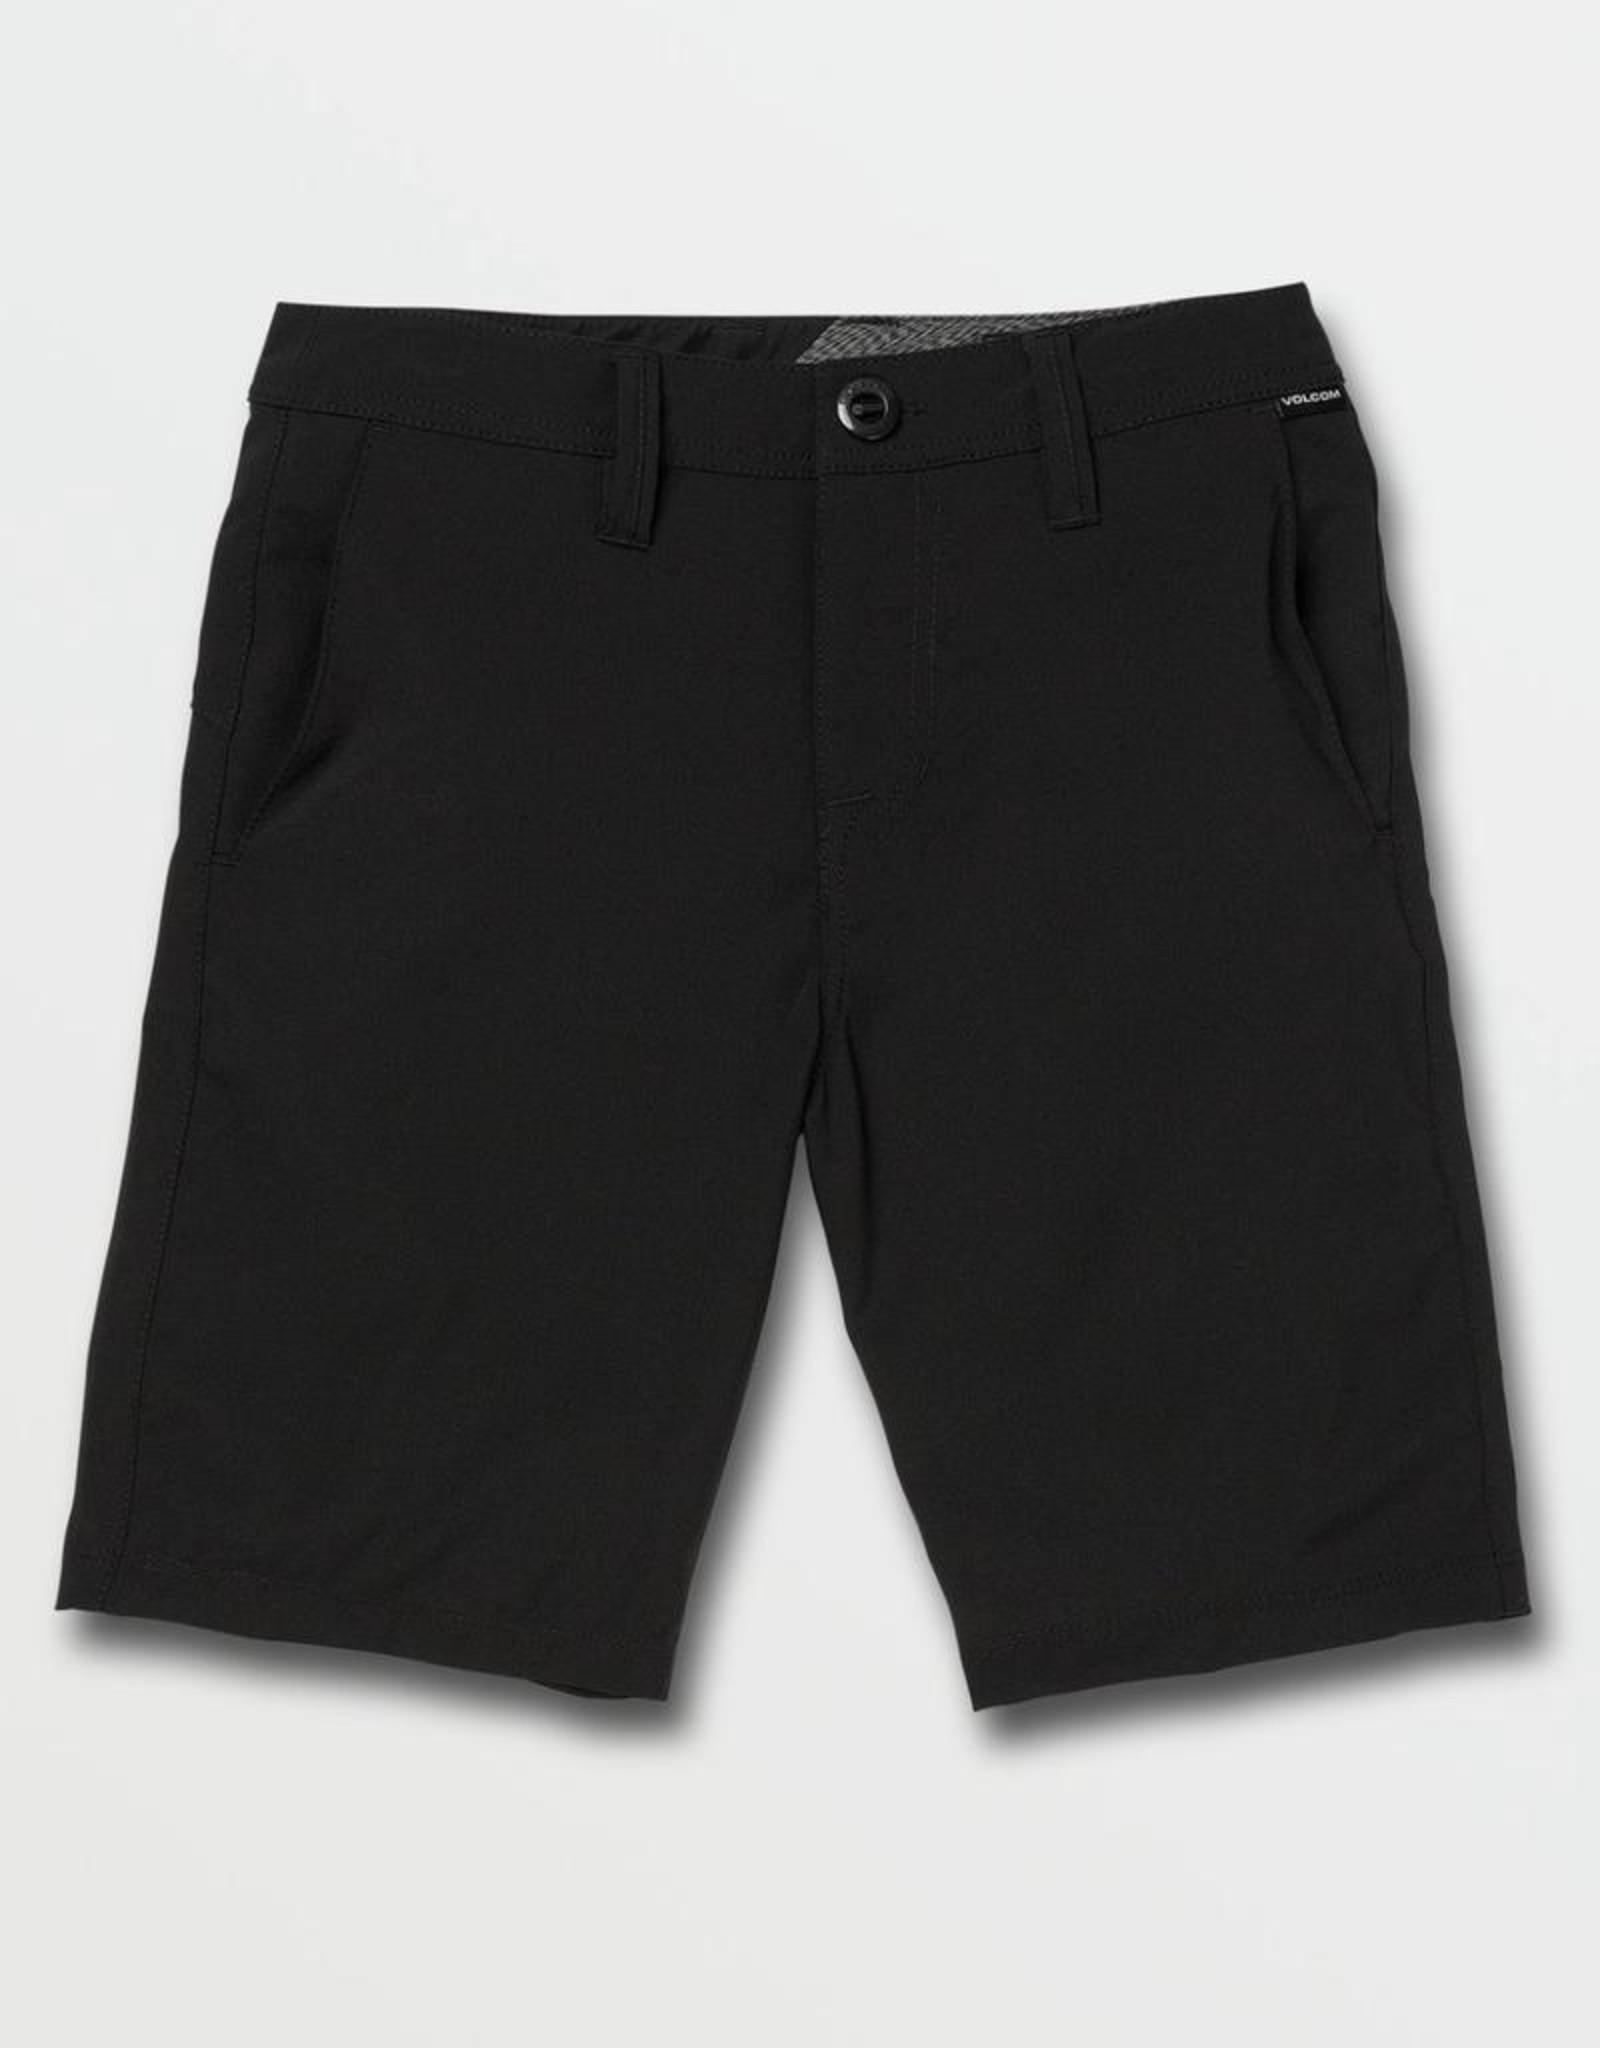 Little Boys Blackout Fricken Surf N' Turf Static Shorts